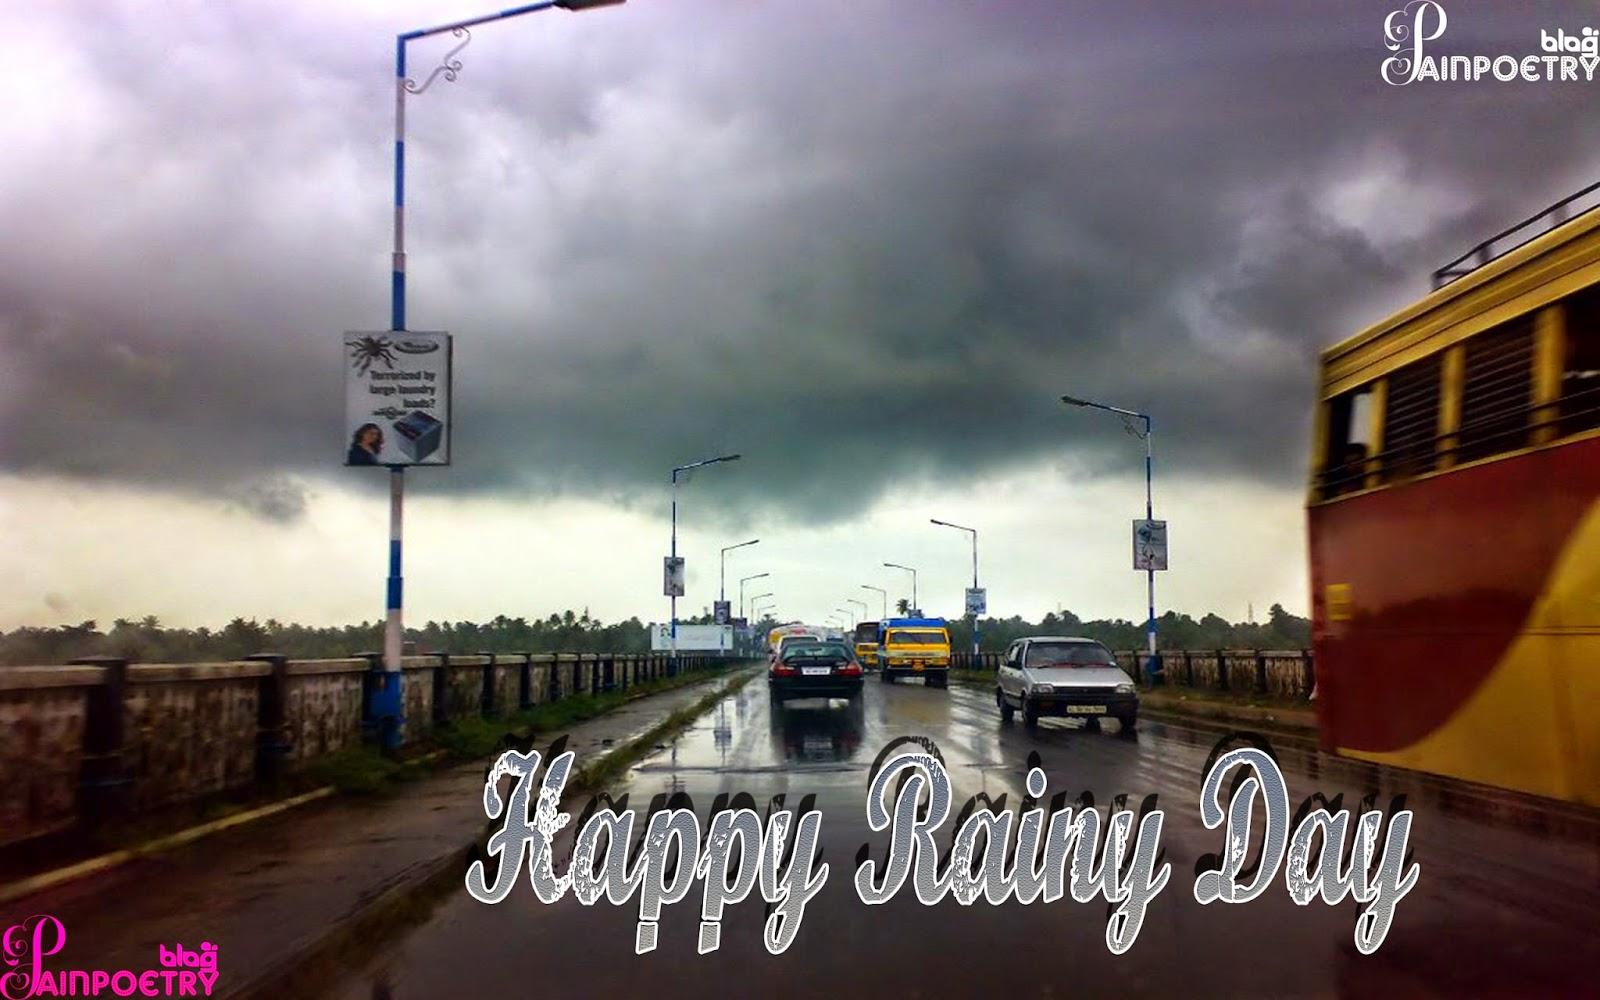 Rainy-Day-Wallpaper-Rainy-Day-Image-HD-Wide